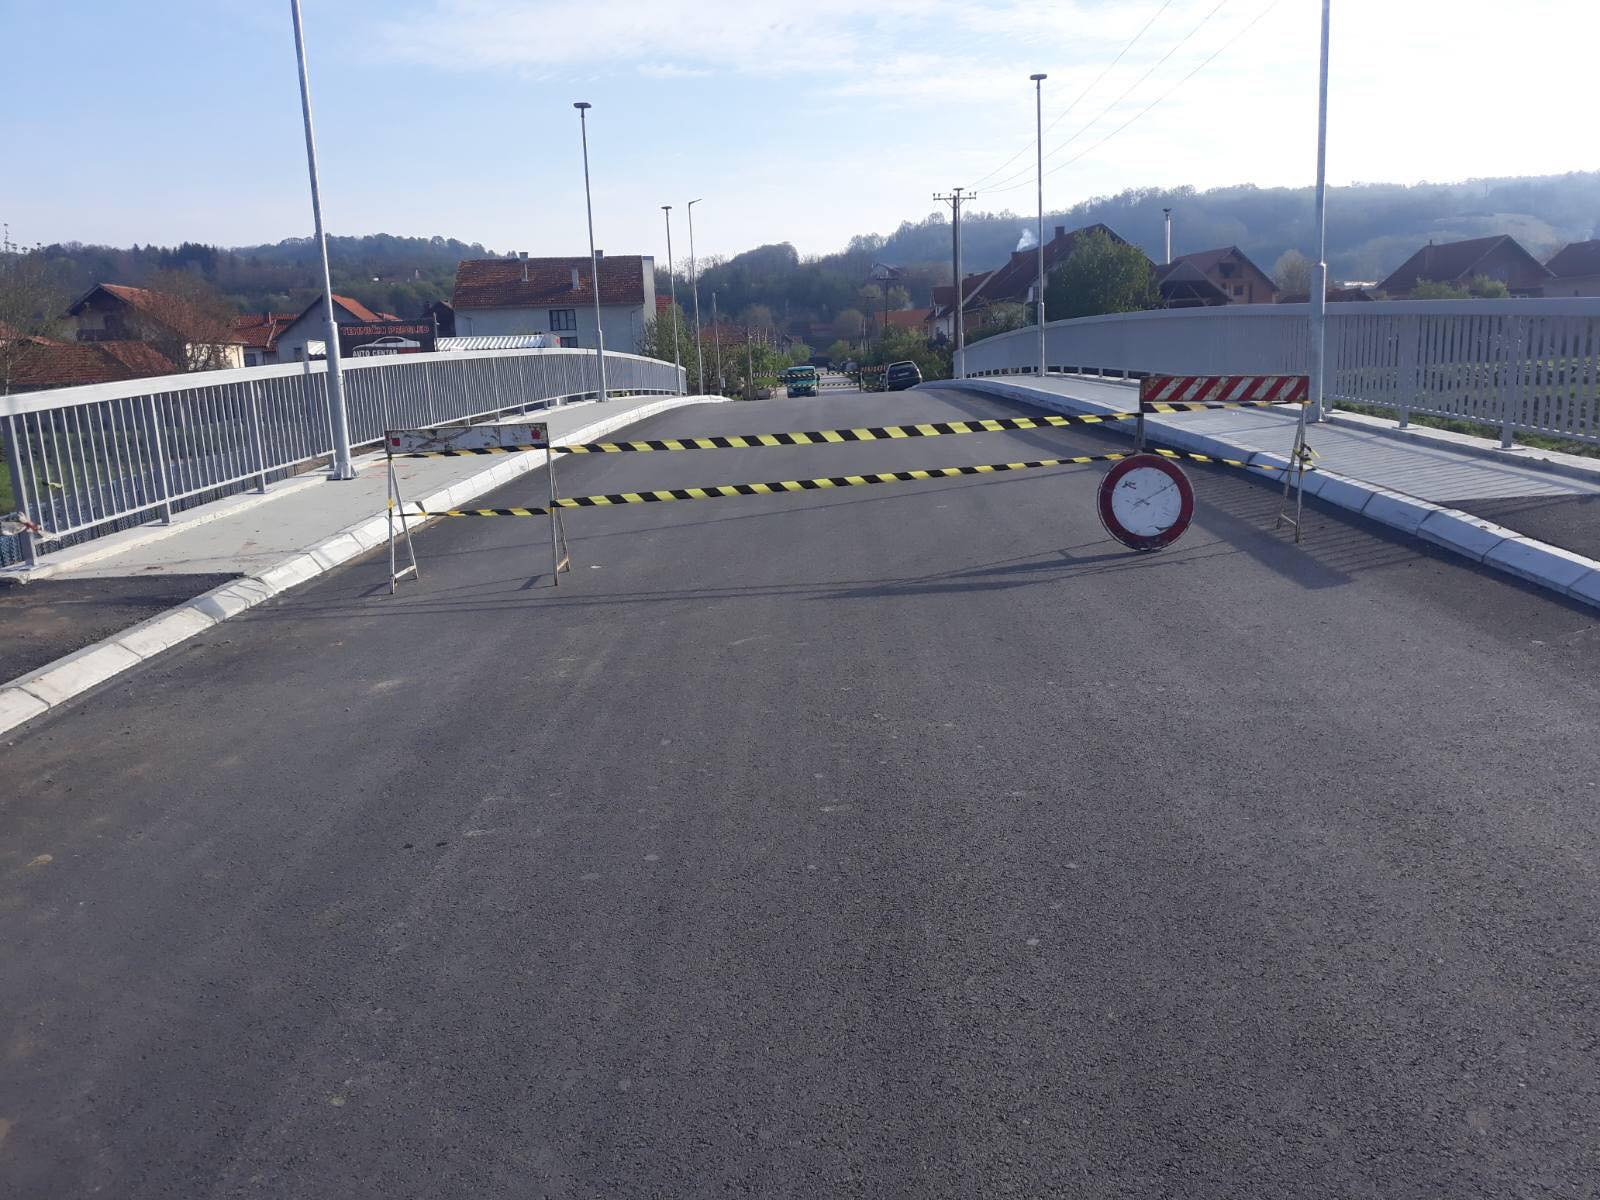 Novi most preko reke Svrljiški Timok, foto: Đ.J.